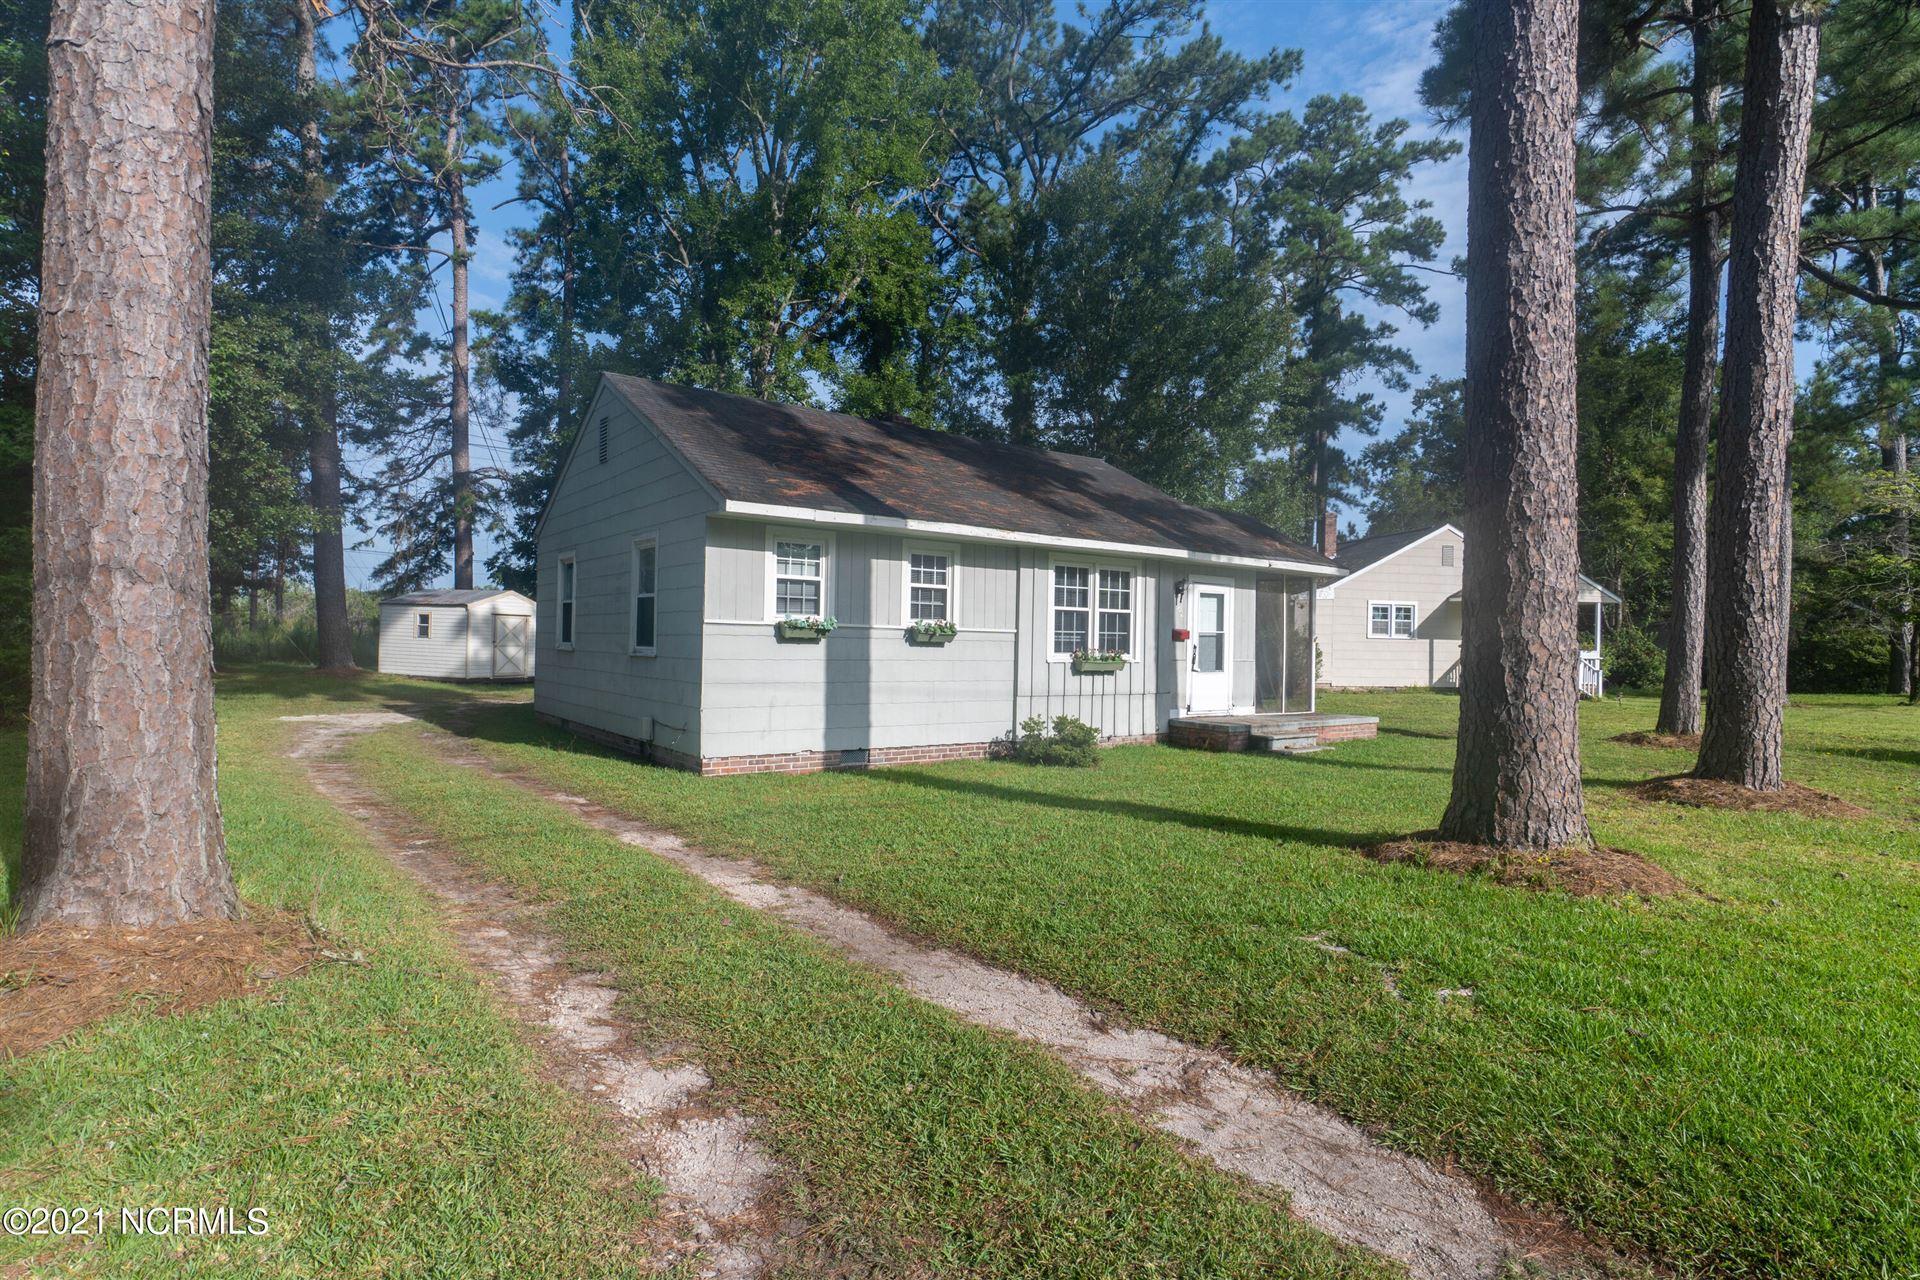 Photo of 502 Sherwood Road, Jacksonville, NC 28540 (MLS # 100292079)